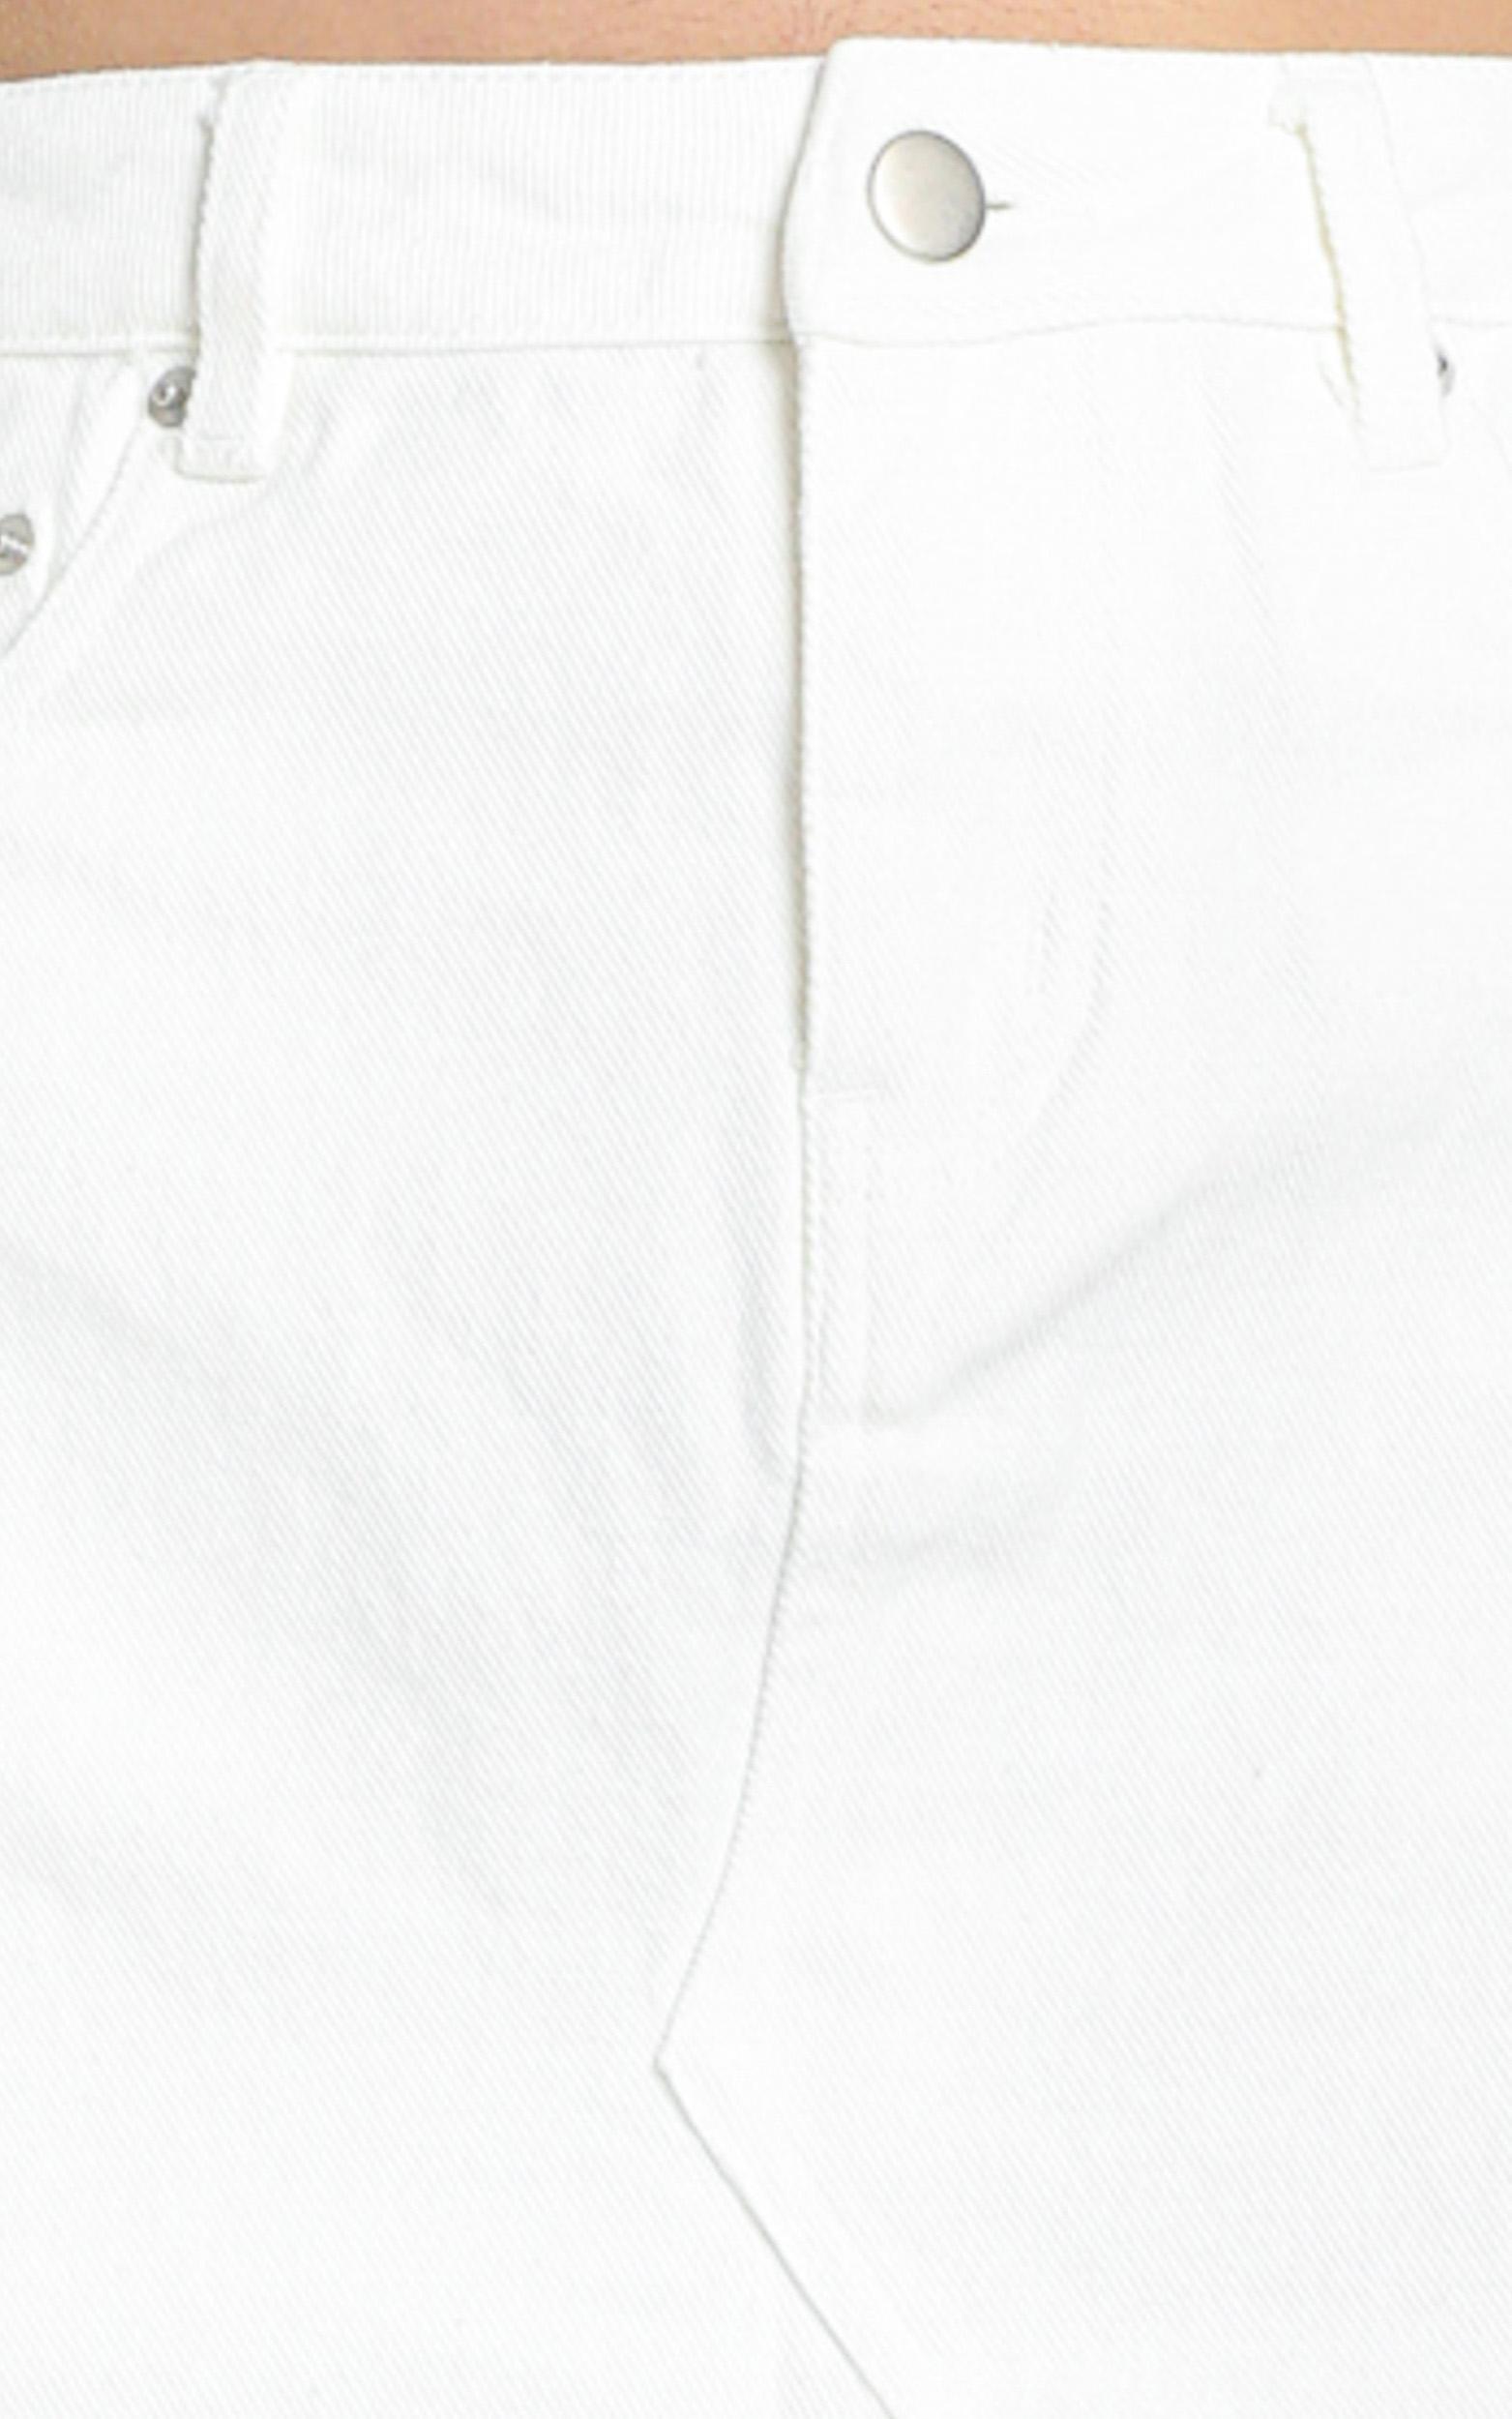 Notch Mini Skirt in White Denim - 6 (XS), White, hi-res image number null